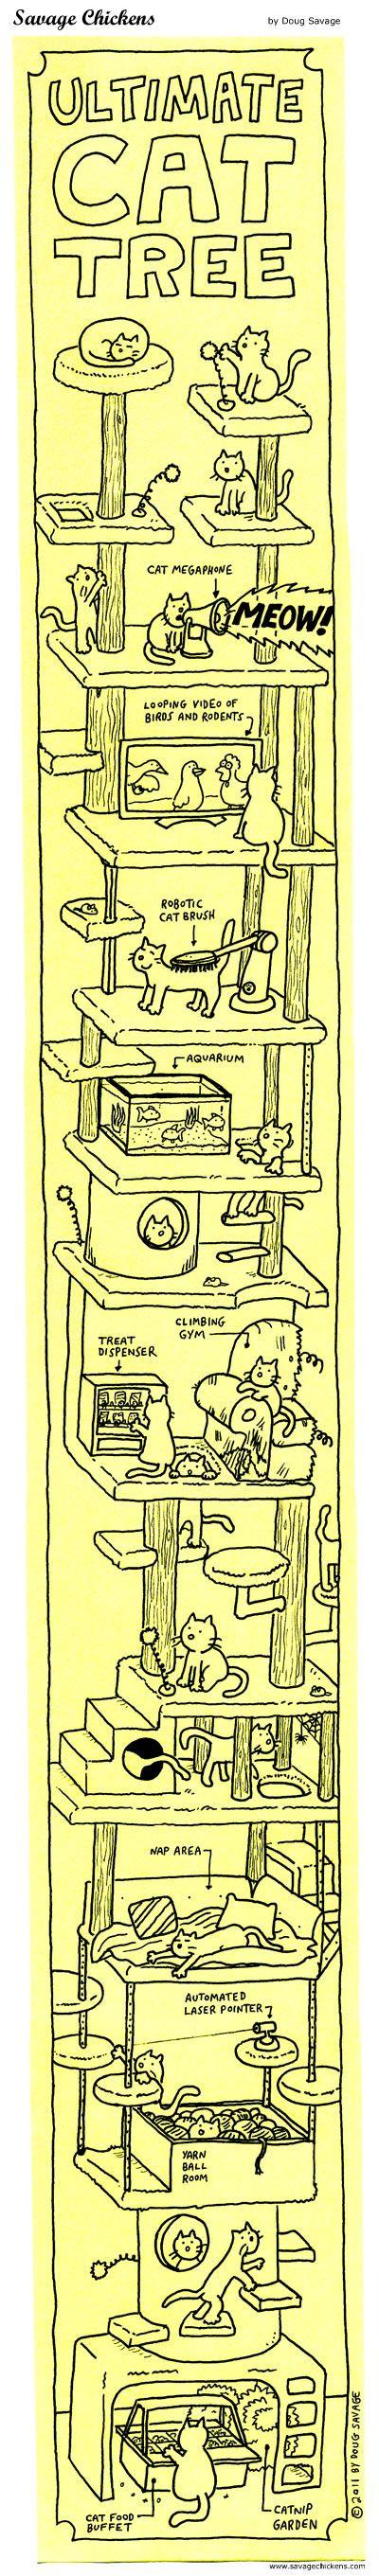 Ultimate Cat Tree Cartoon | Savage Chickens - Cartoons on Sticky Notes by Doug Savage